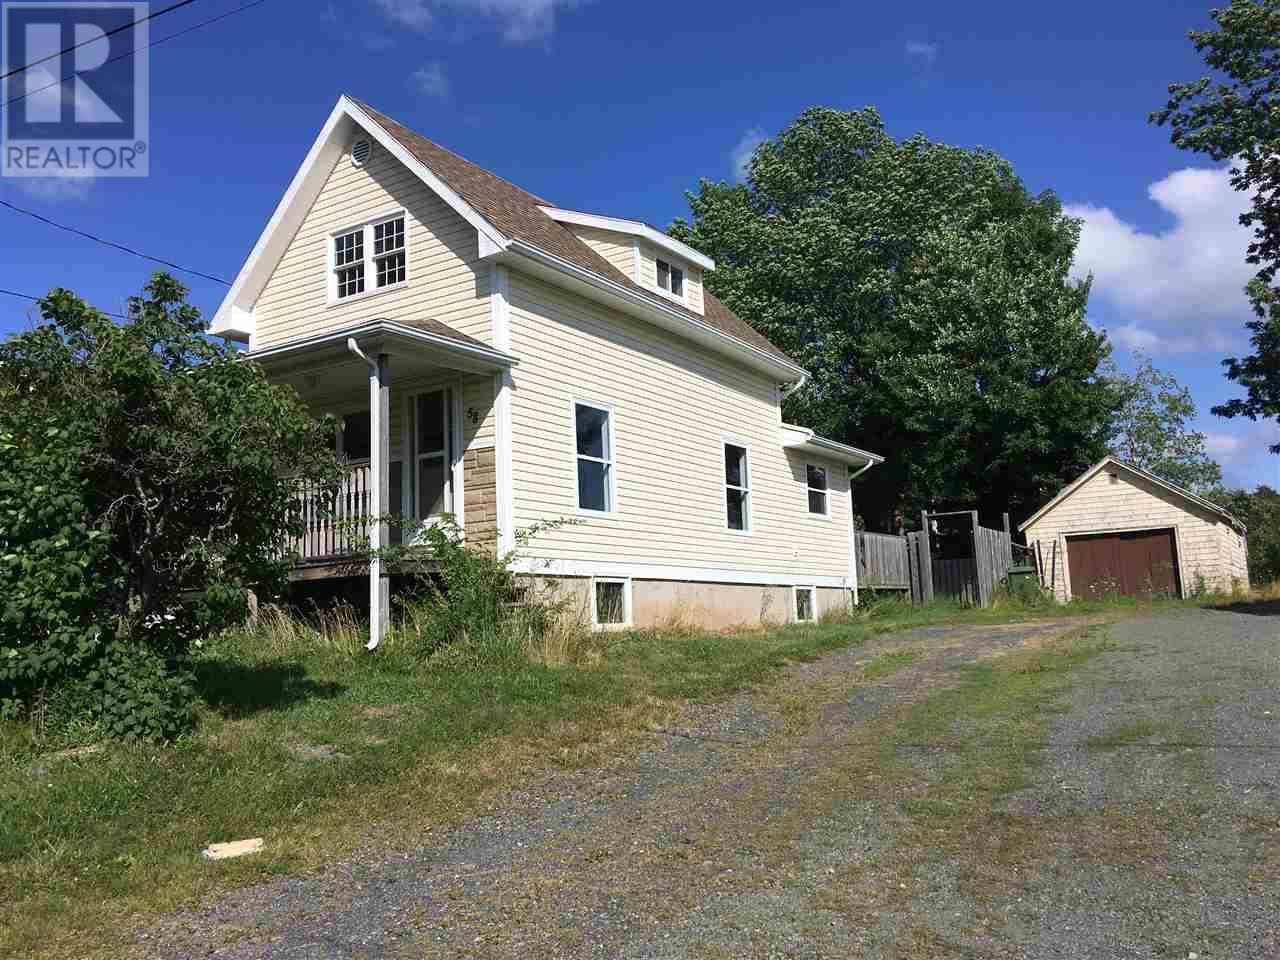 House for sale at 58 Park St Trenton Nova Scotia - MLS: 201919665